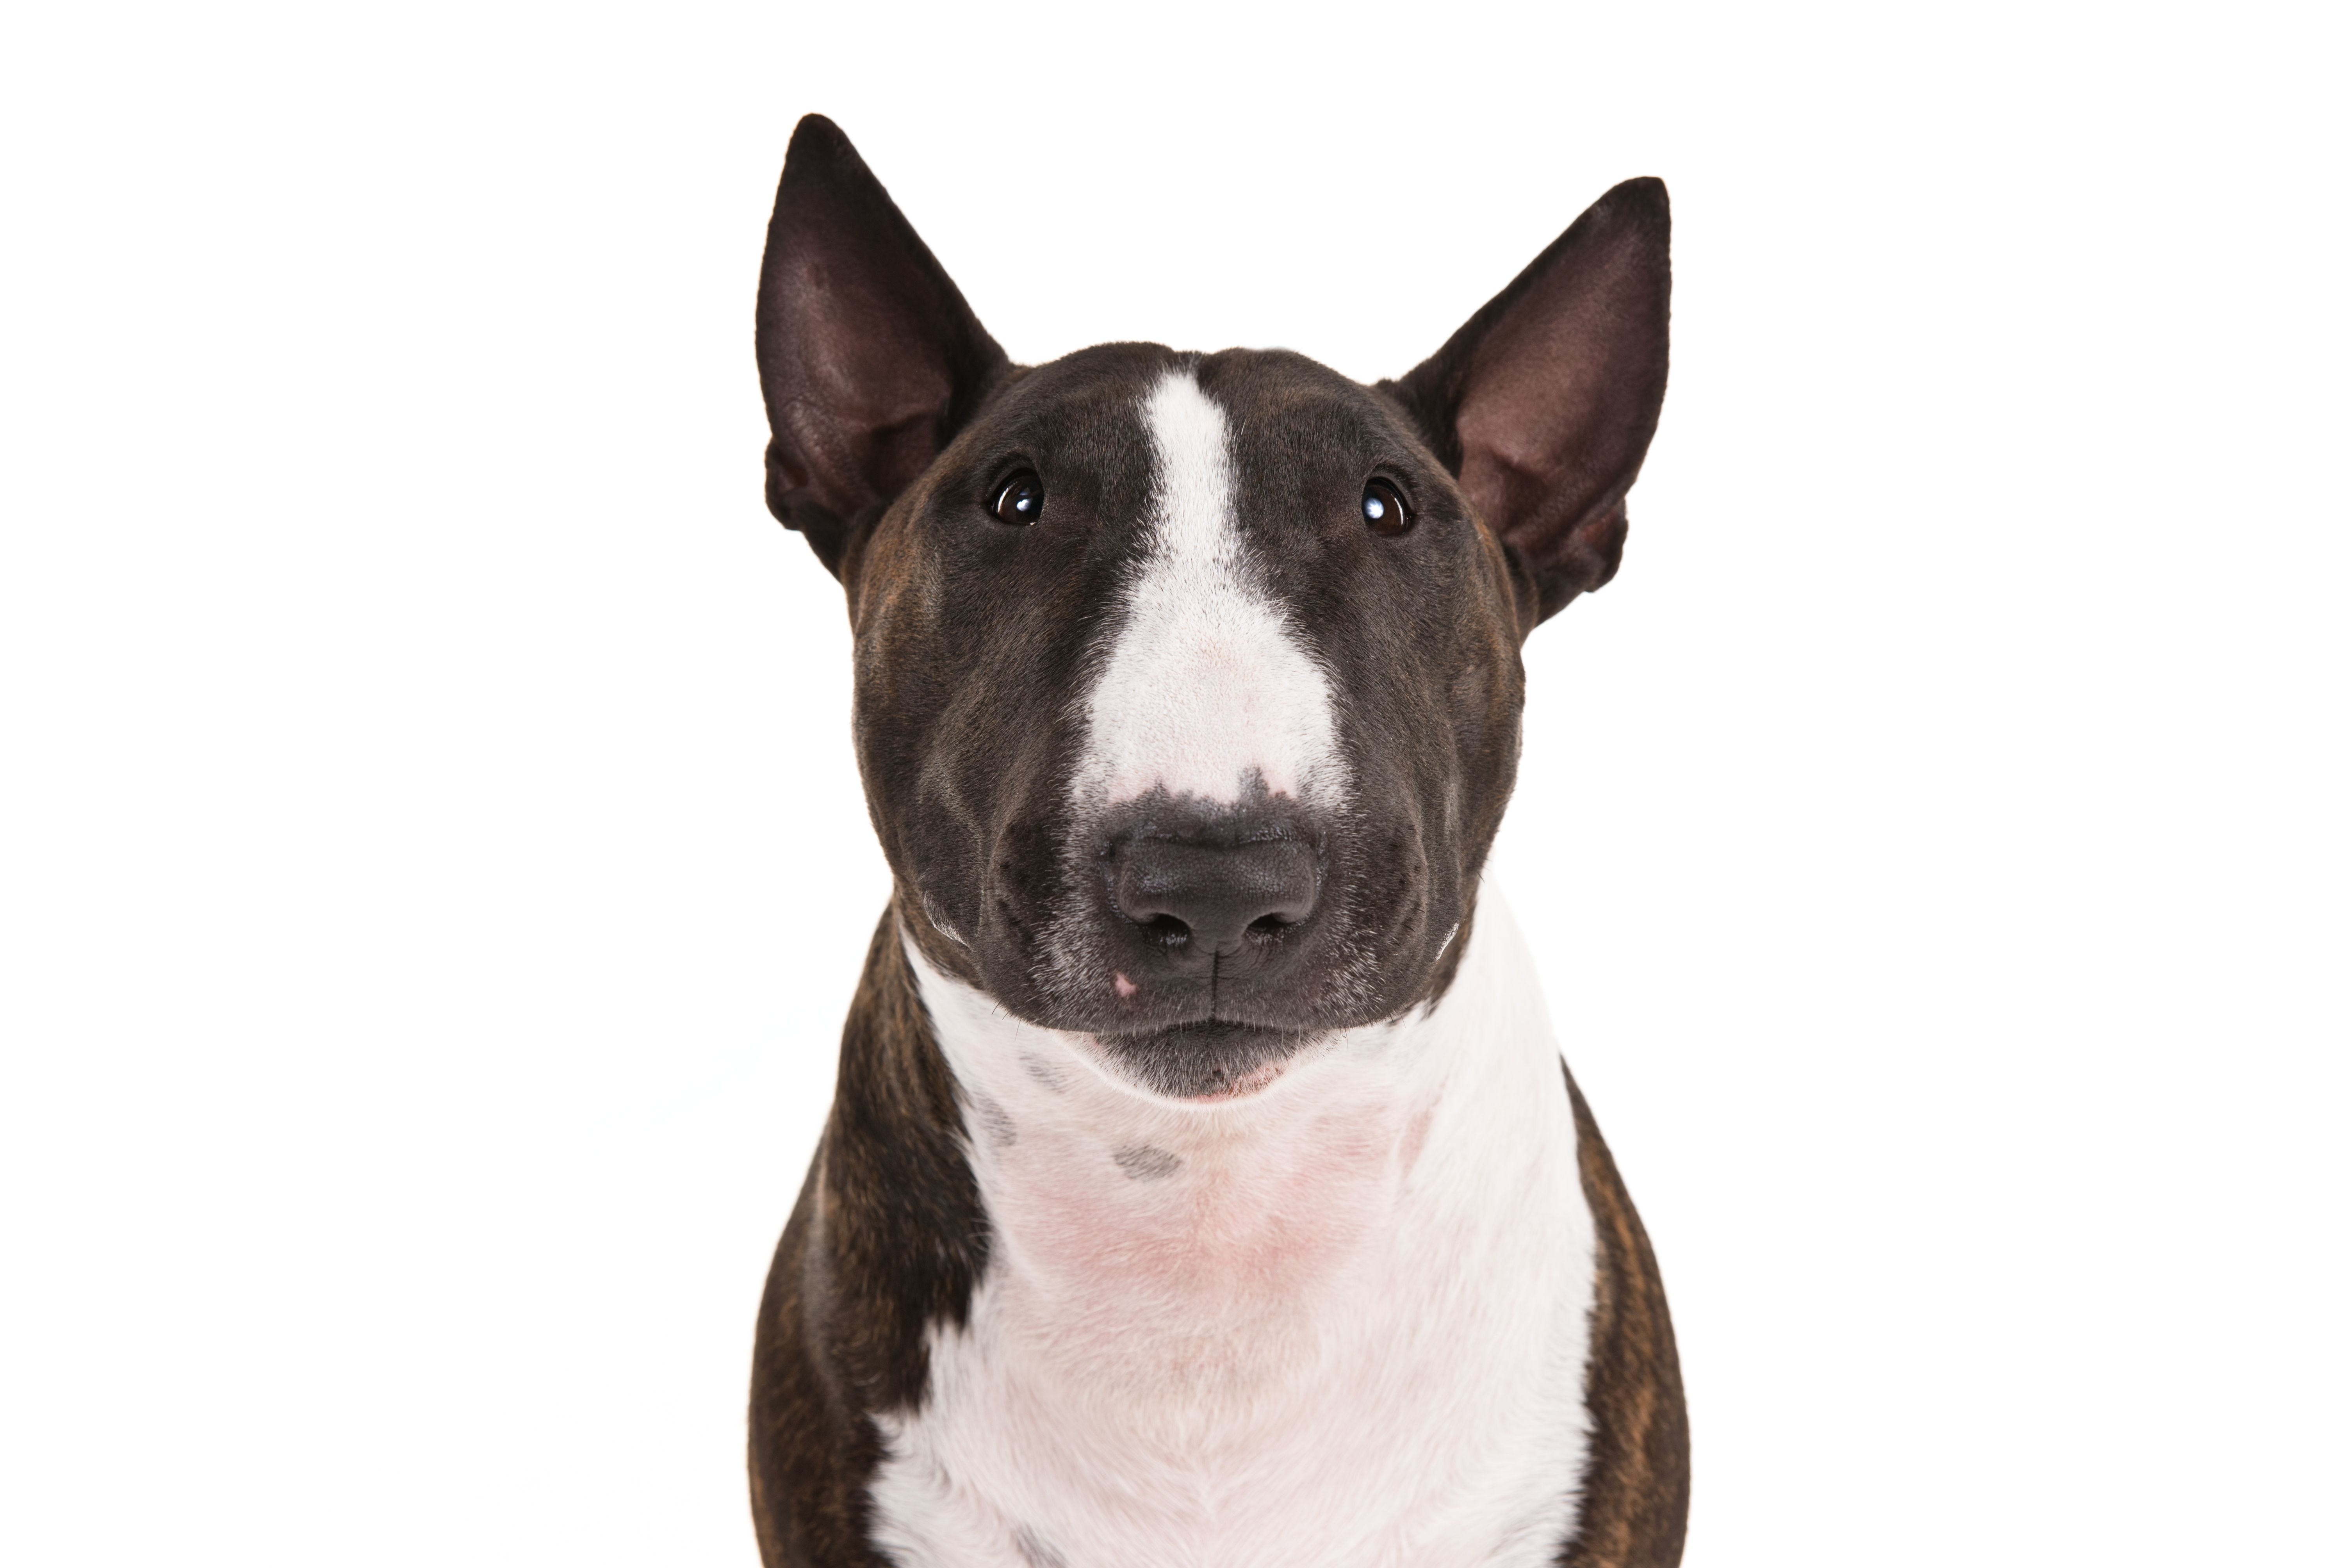 Miniature Bull Terrier Dog Breed Information Miniature Bull Terrier Pitbull Terrier Terrier Dog Breeds